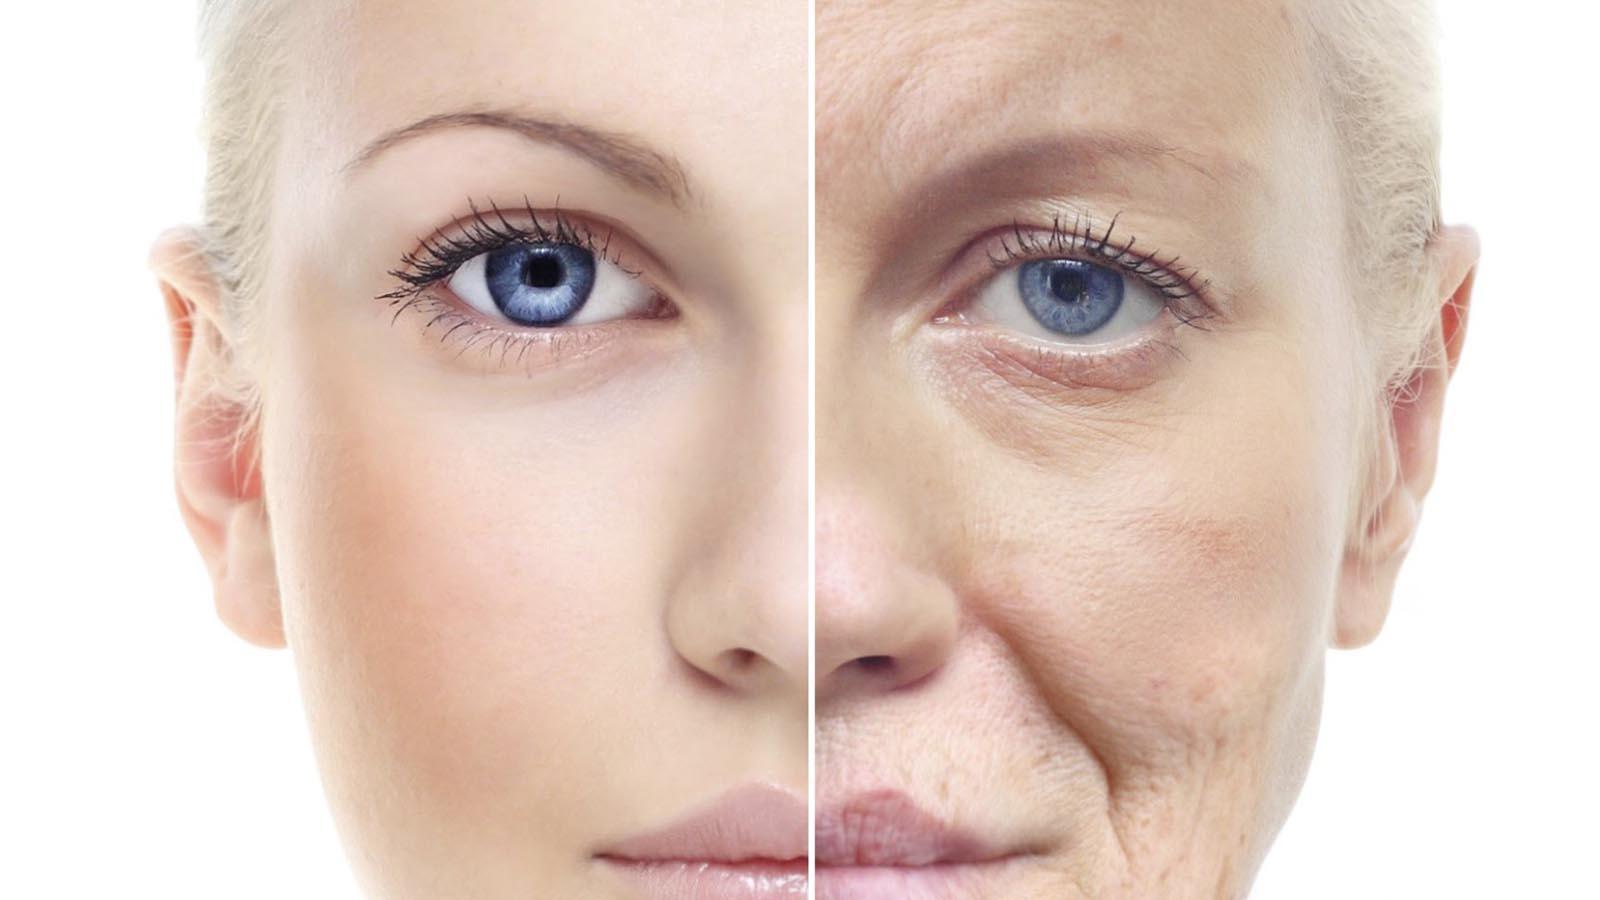 ae00d401fec72 أول علاج جيني ناجح يمكن أن يعكس الشيخوخة